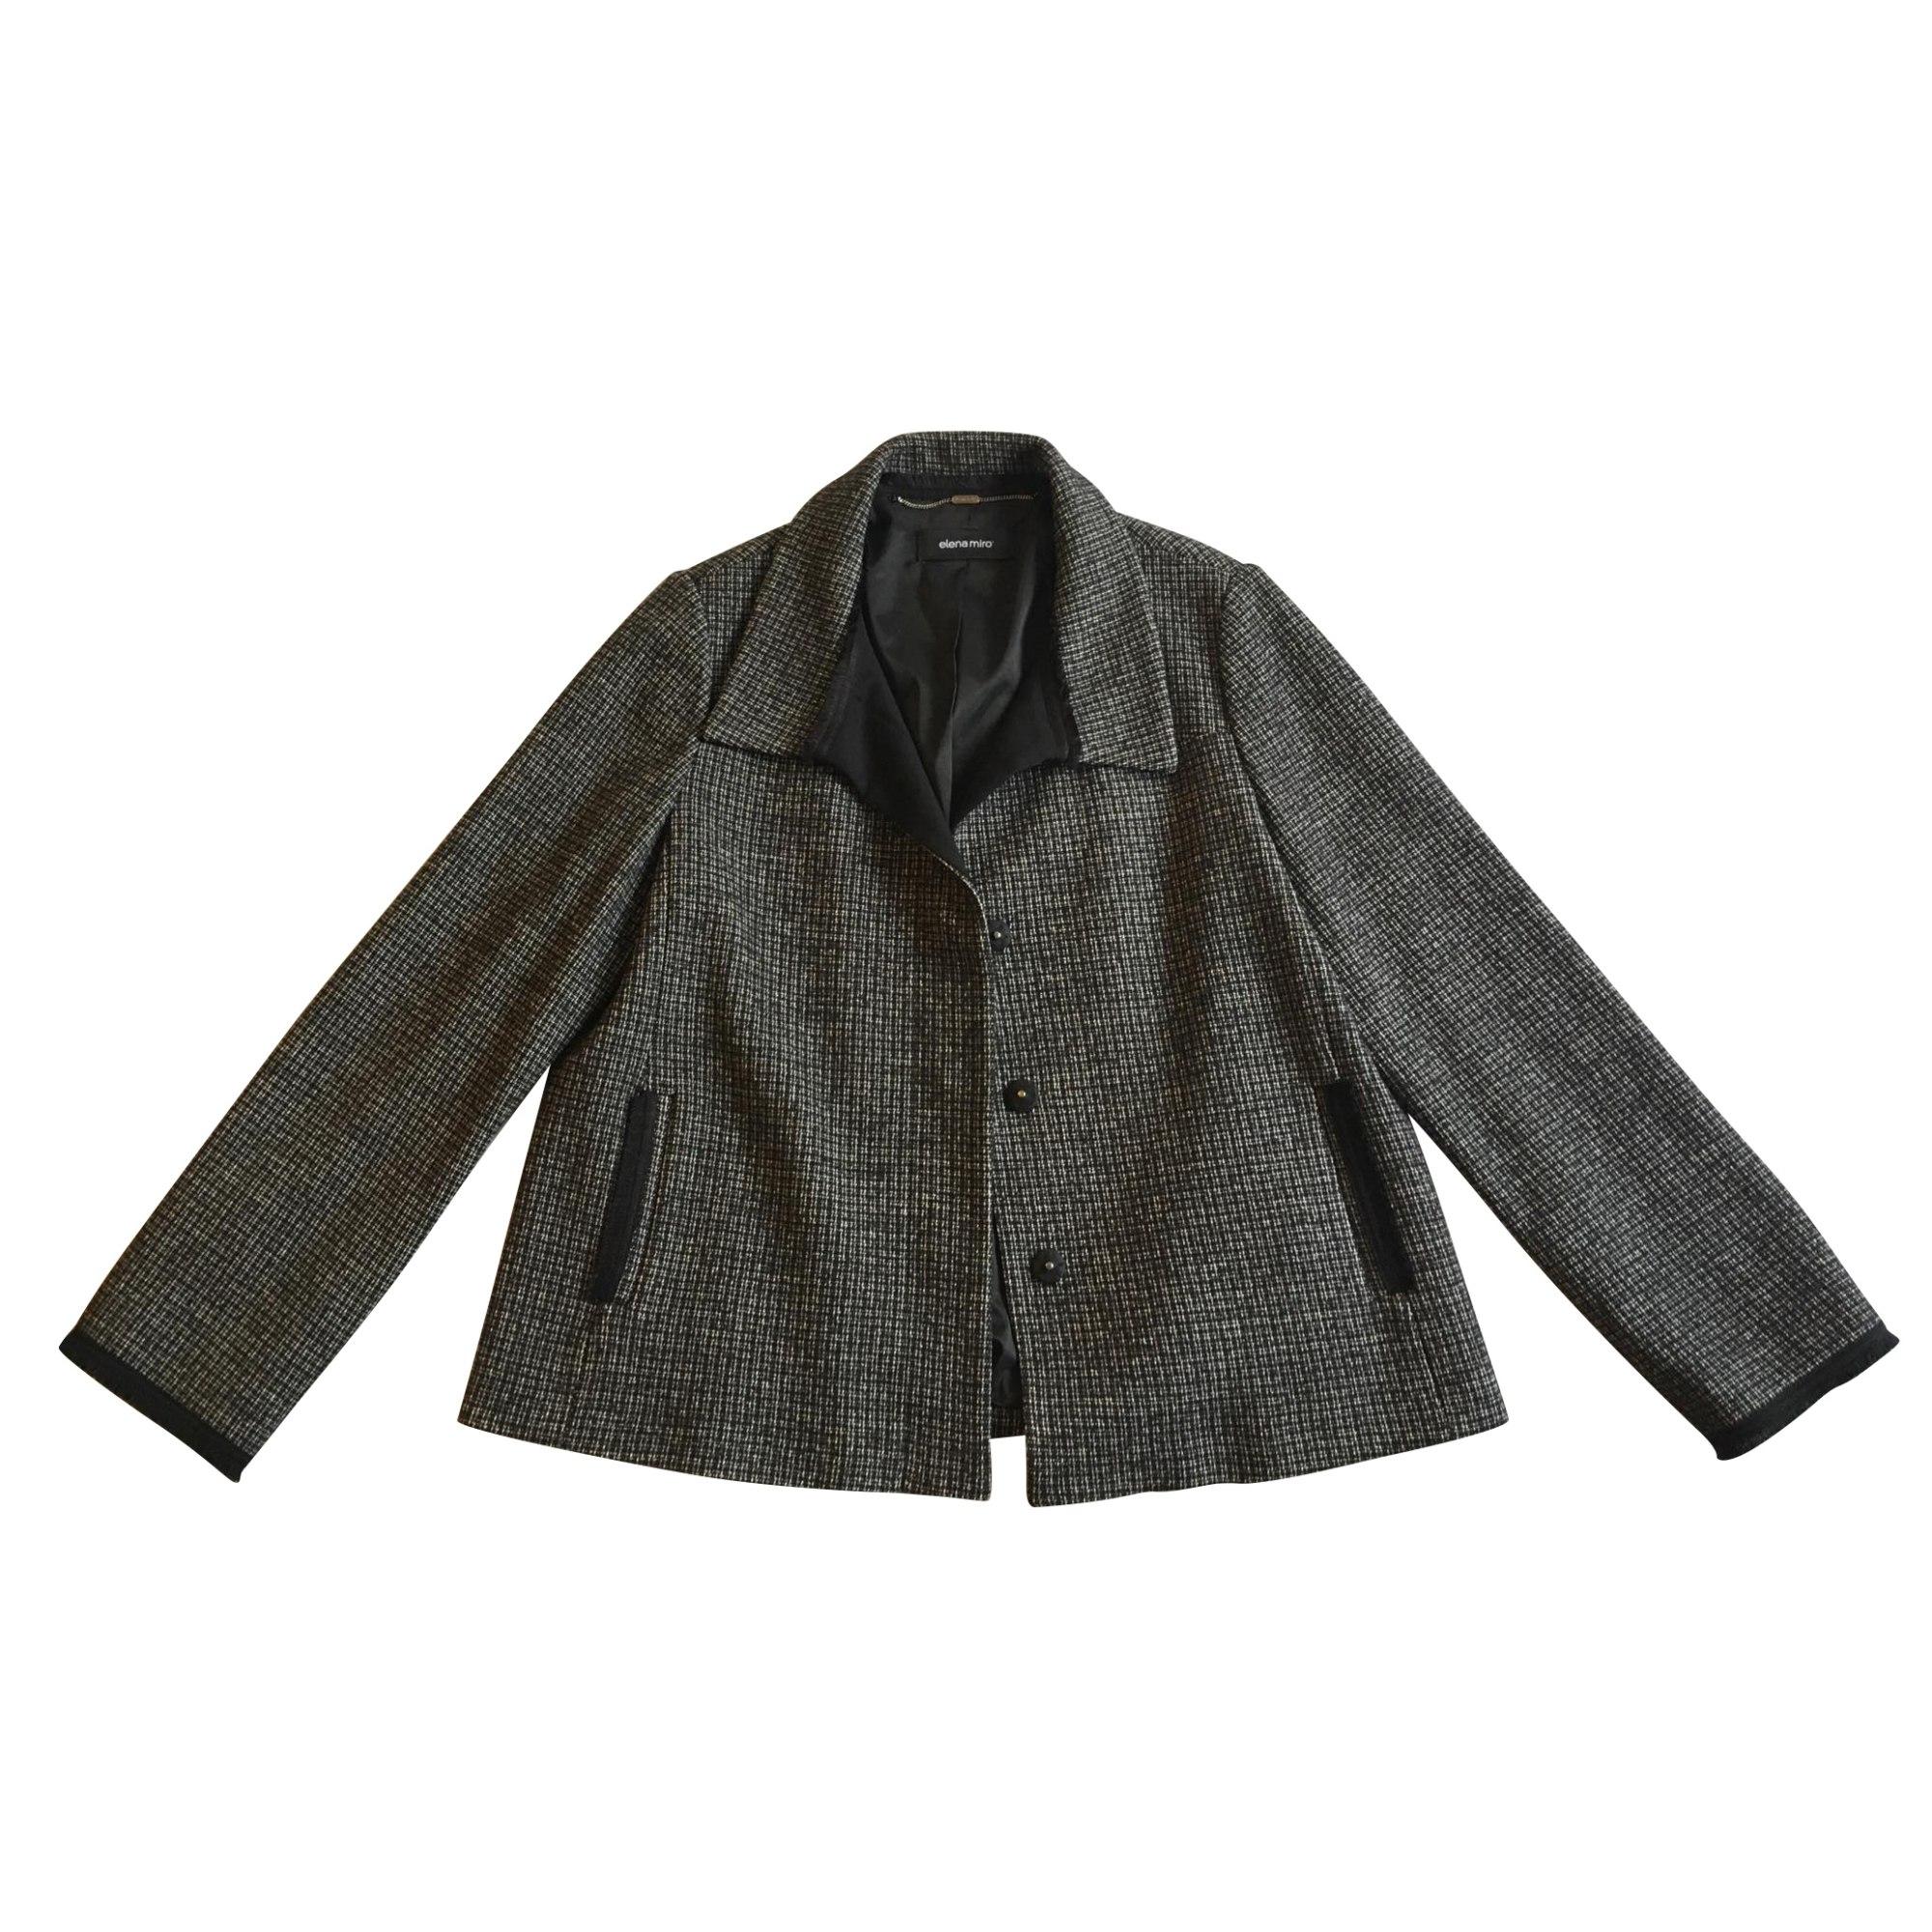 Manteau ELENA MIRO Noir et blanc